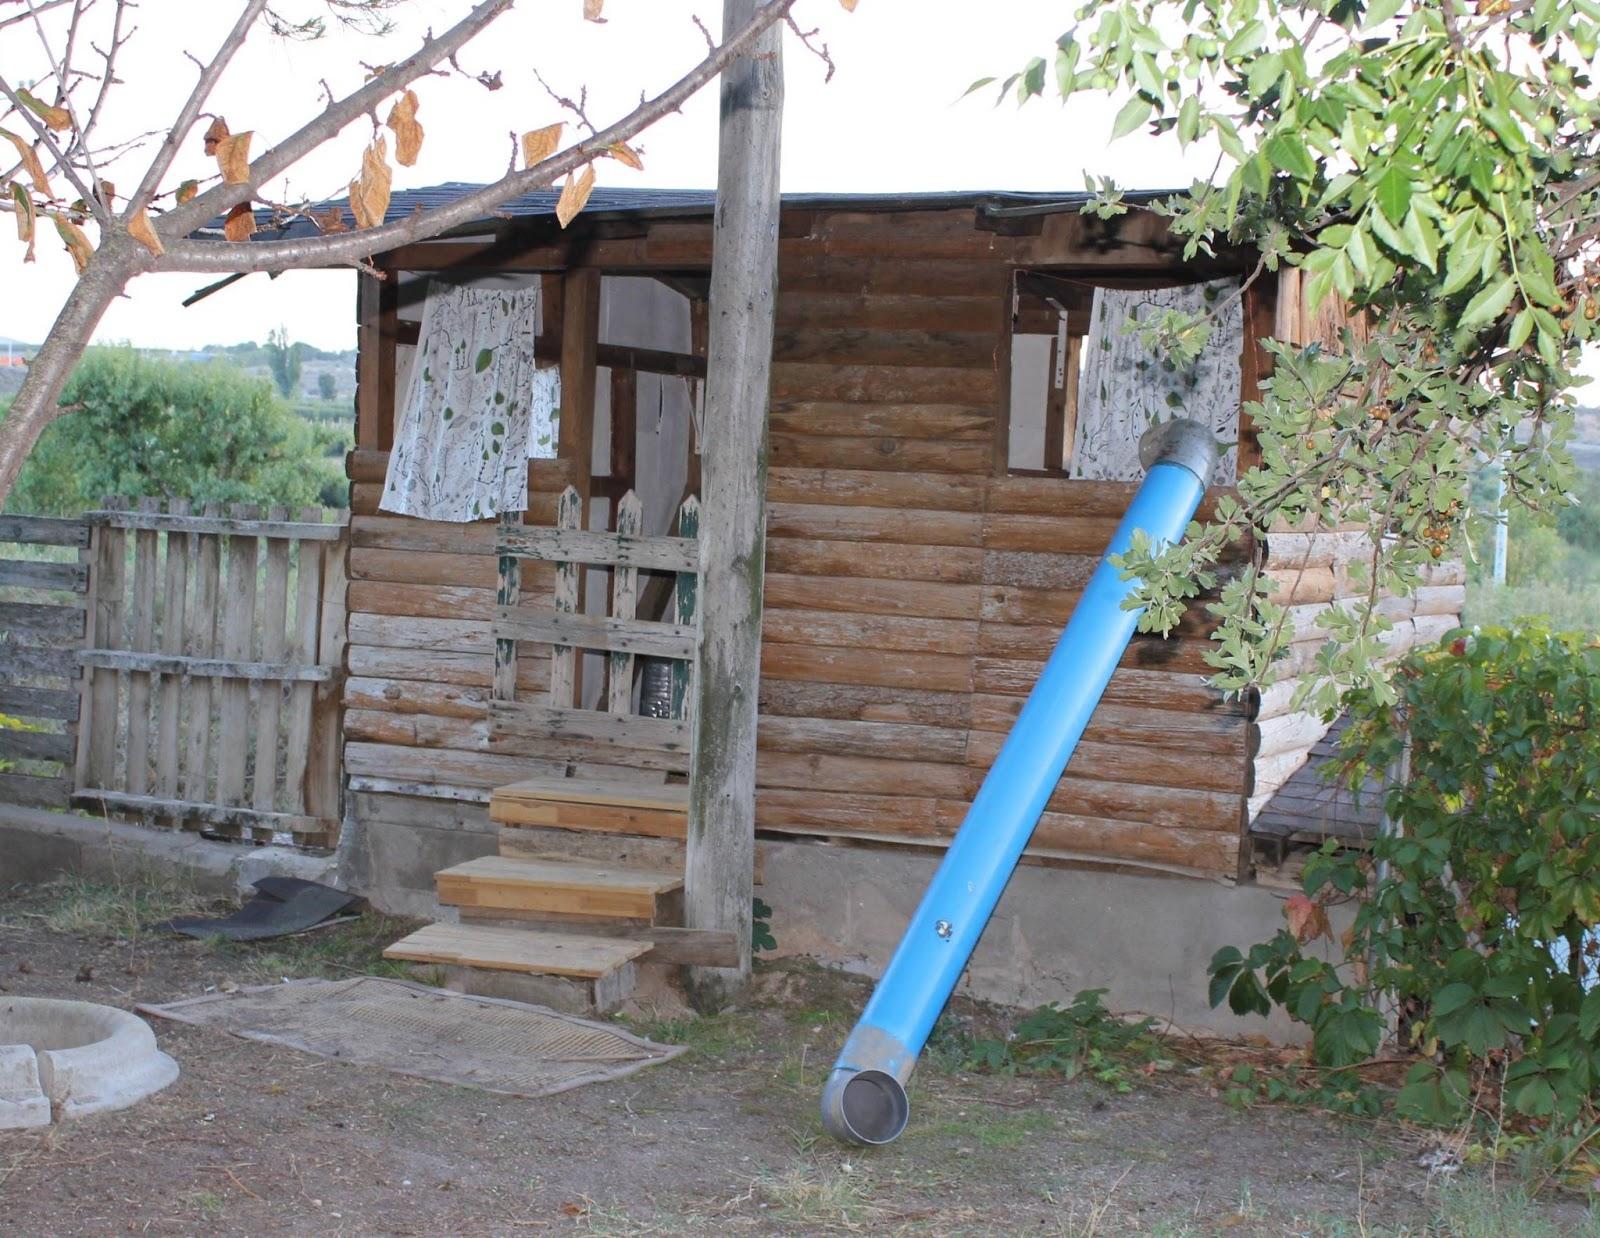 3 macarrons la casita de madera - La casita de madera ...